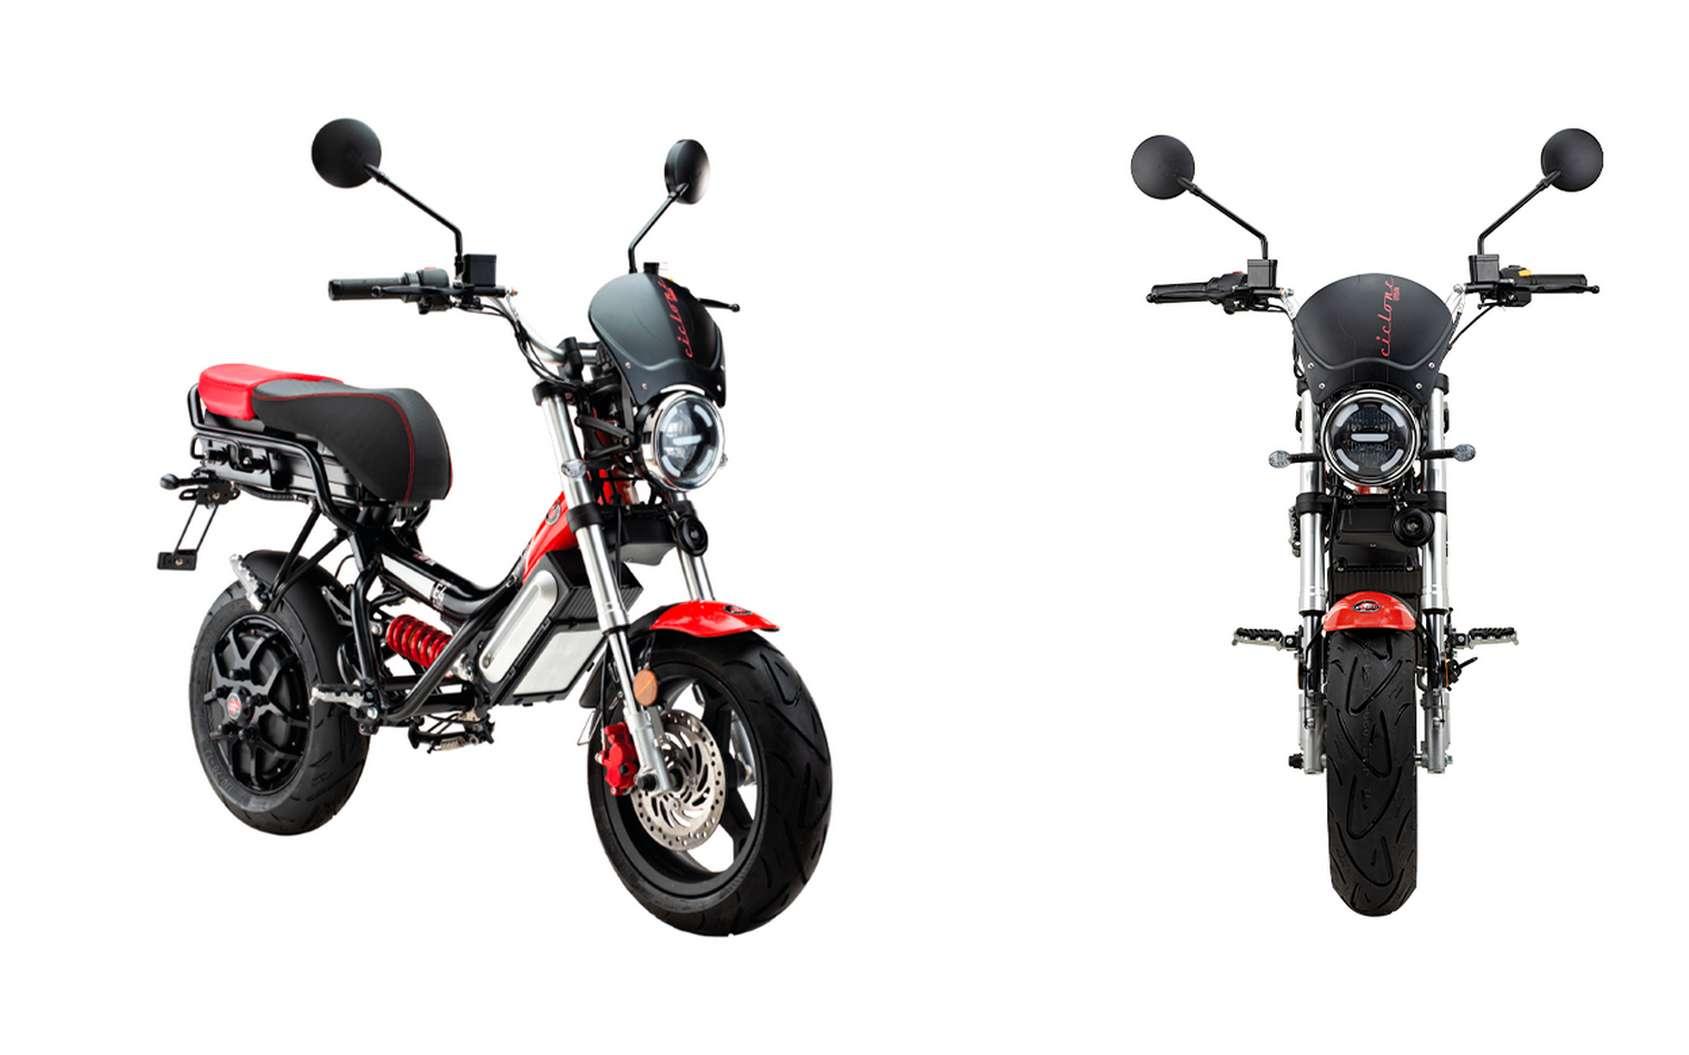 Le scooter électrique Garelli Ciclone E4 dans sa version Urban. © Garelli